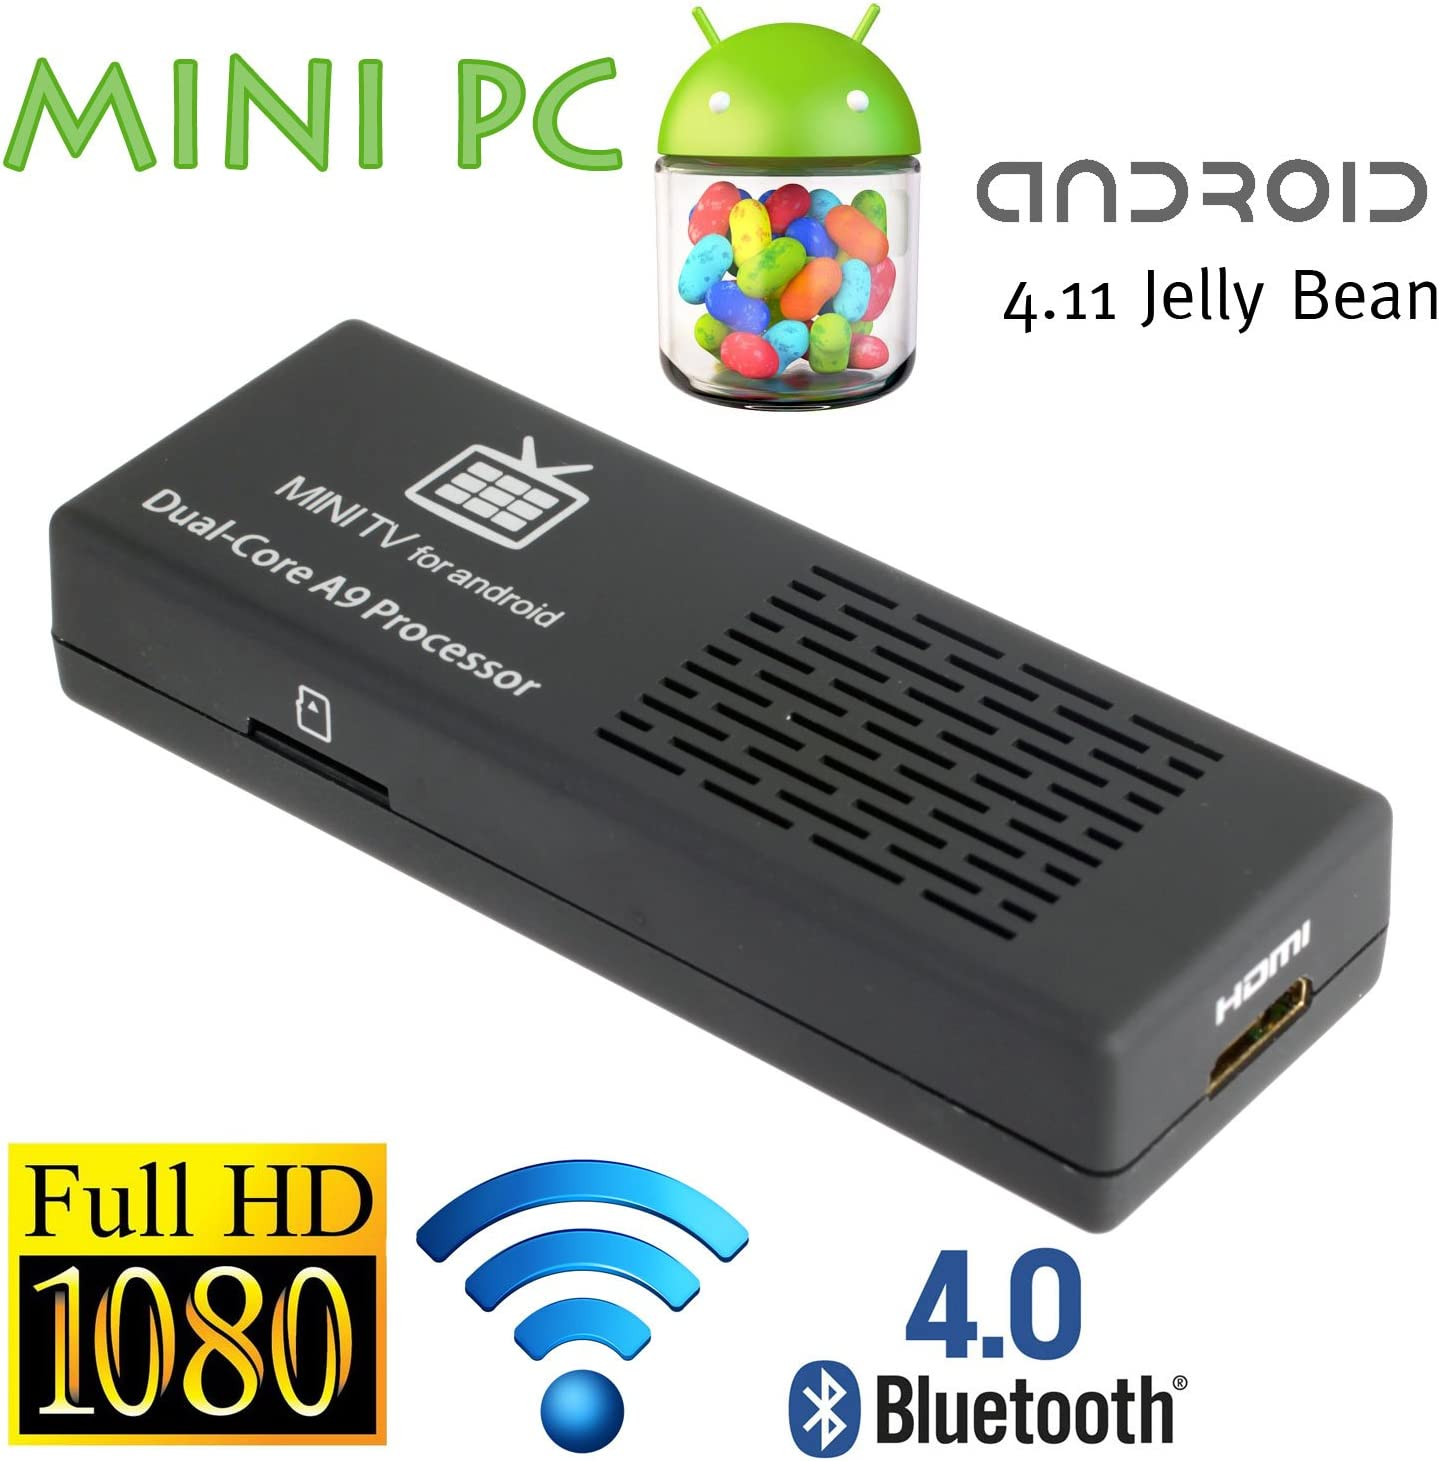 8 GB Android 4.1.1 Mini PC Smart TV Box Jugador Dual Core 1,6 GHz HDMI Bluetooth: Amazon.es: Electrónica